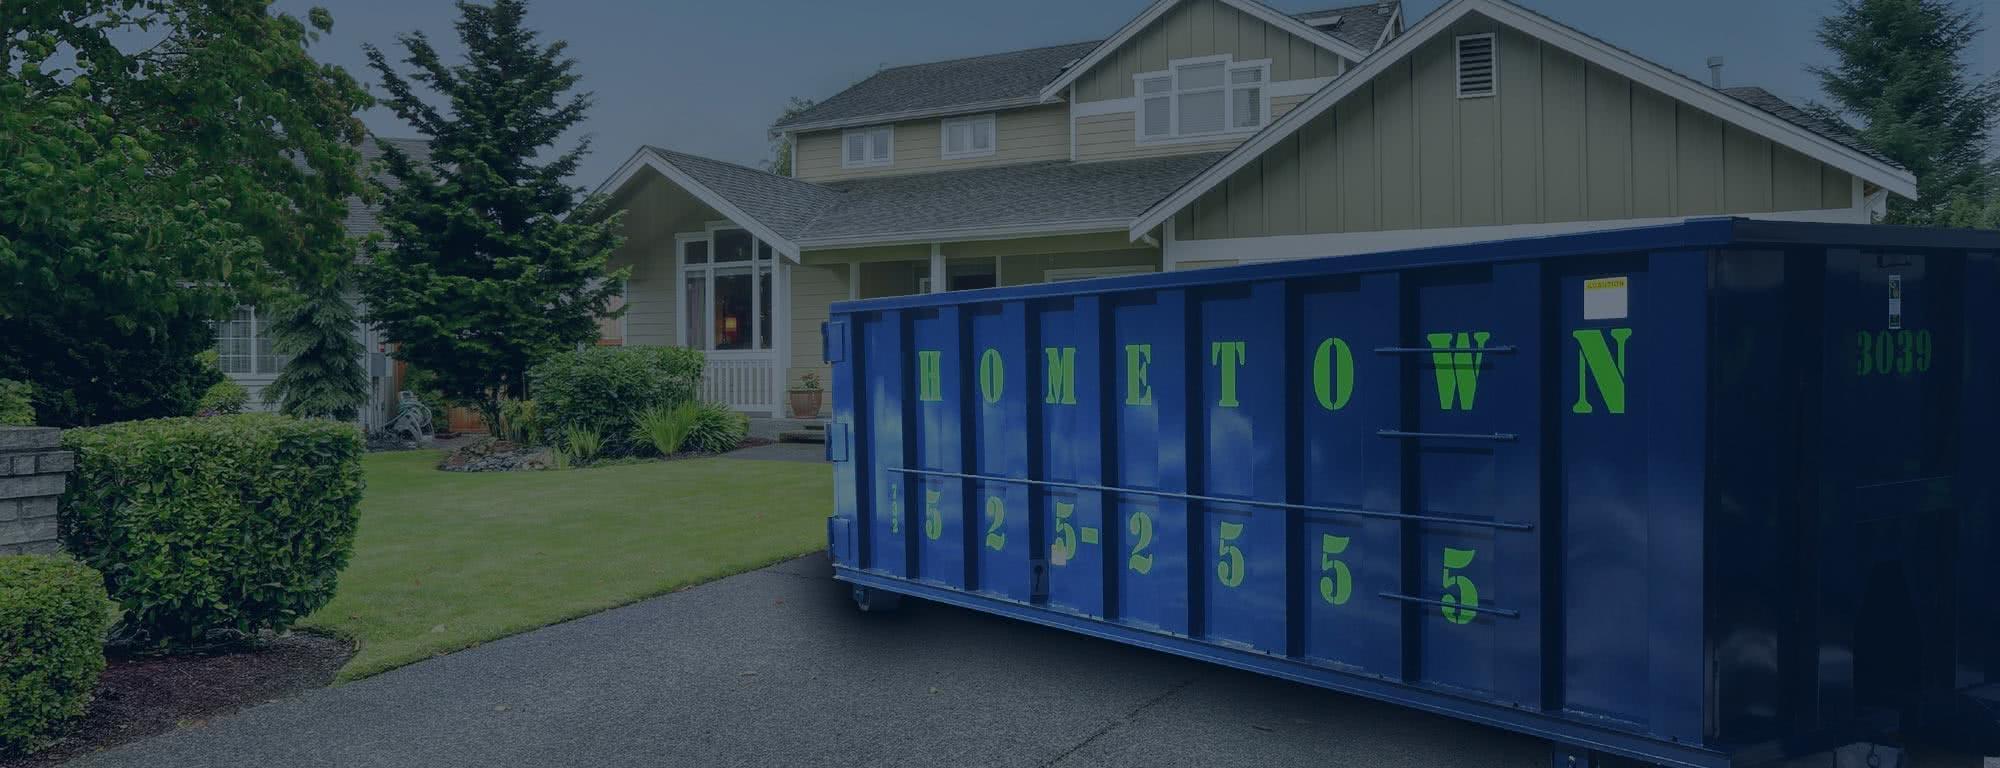 Dumpster Rentals in NJ   New Jersey's Best Dumpster Rental Service